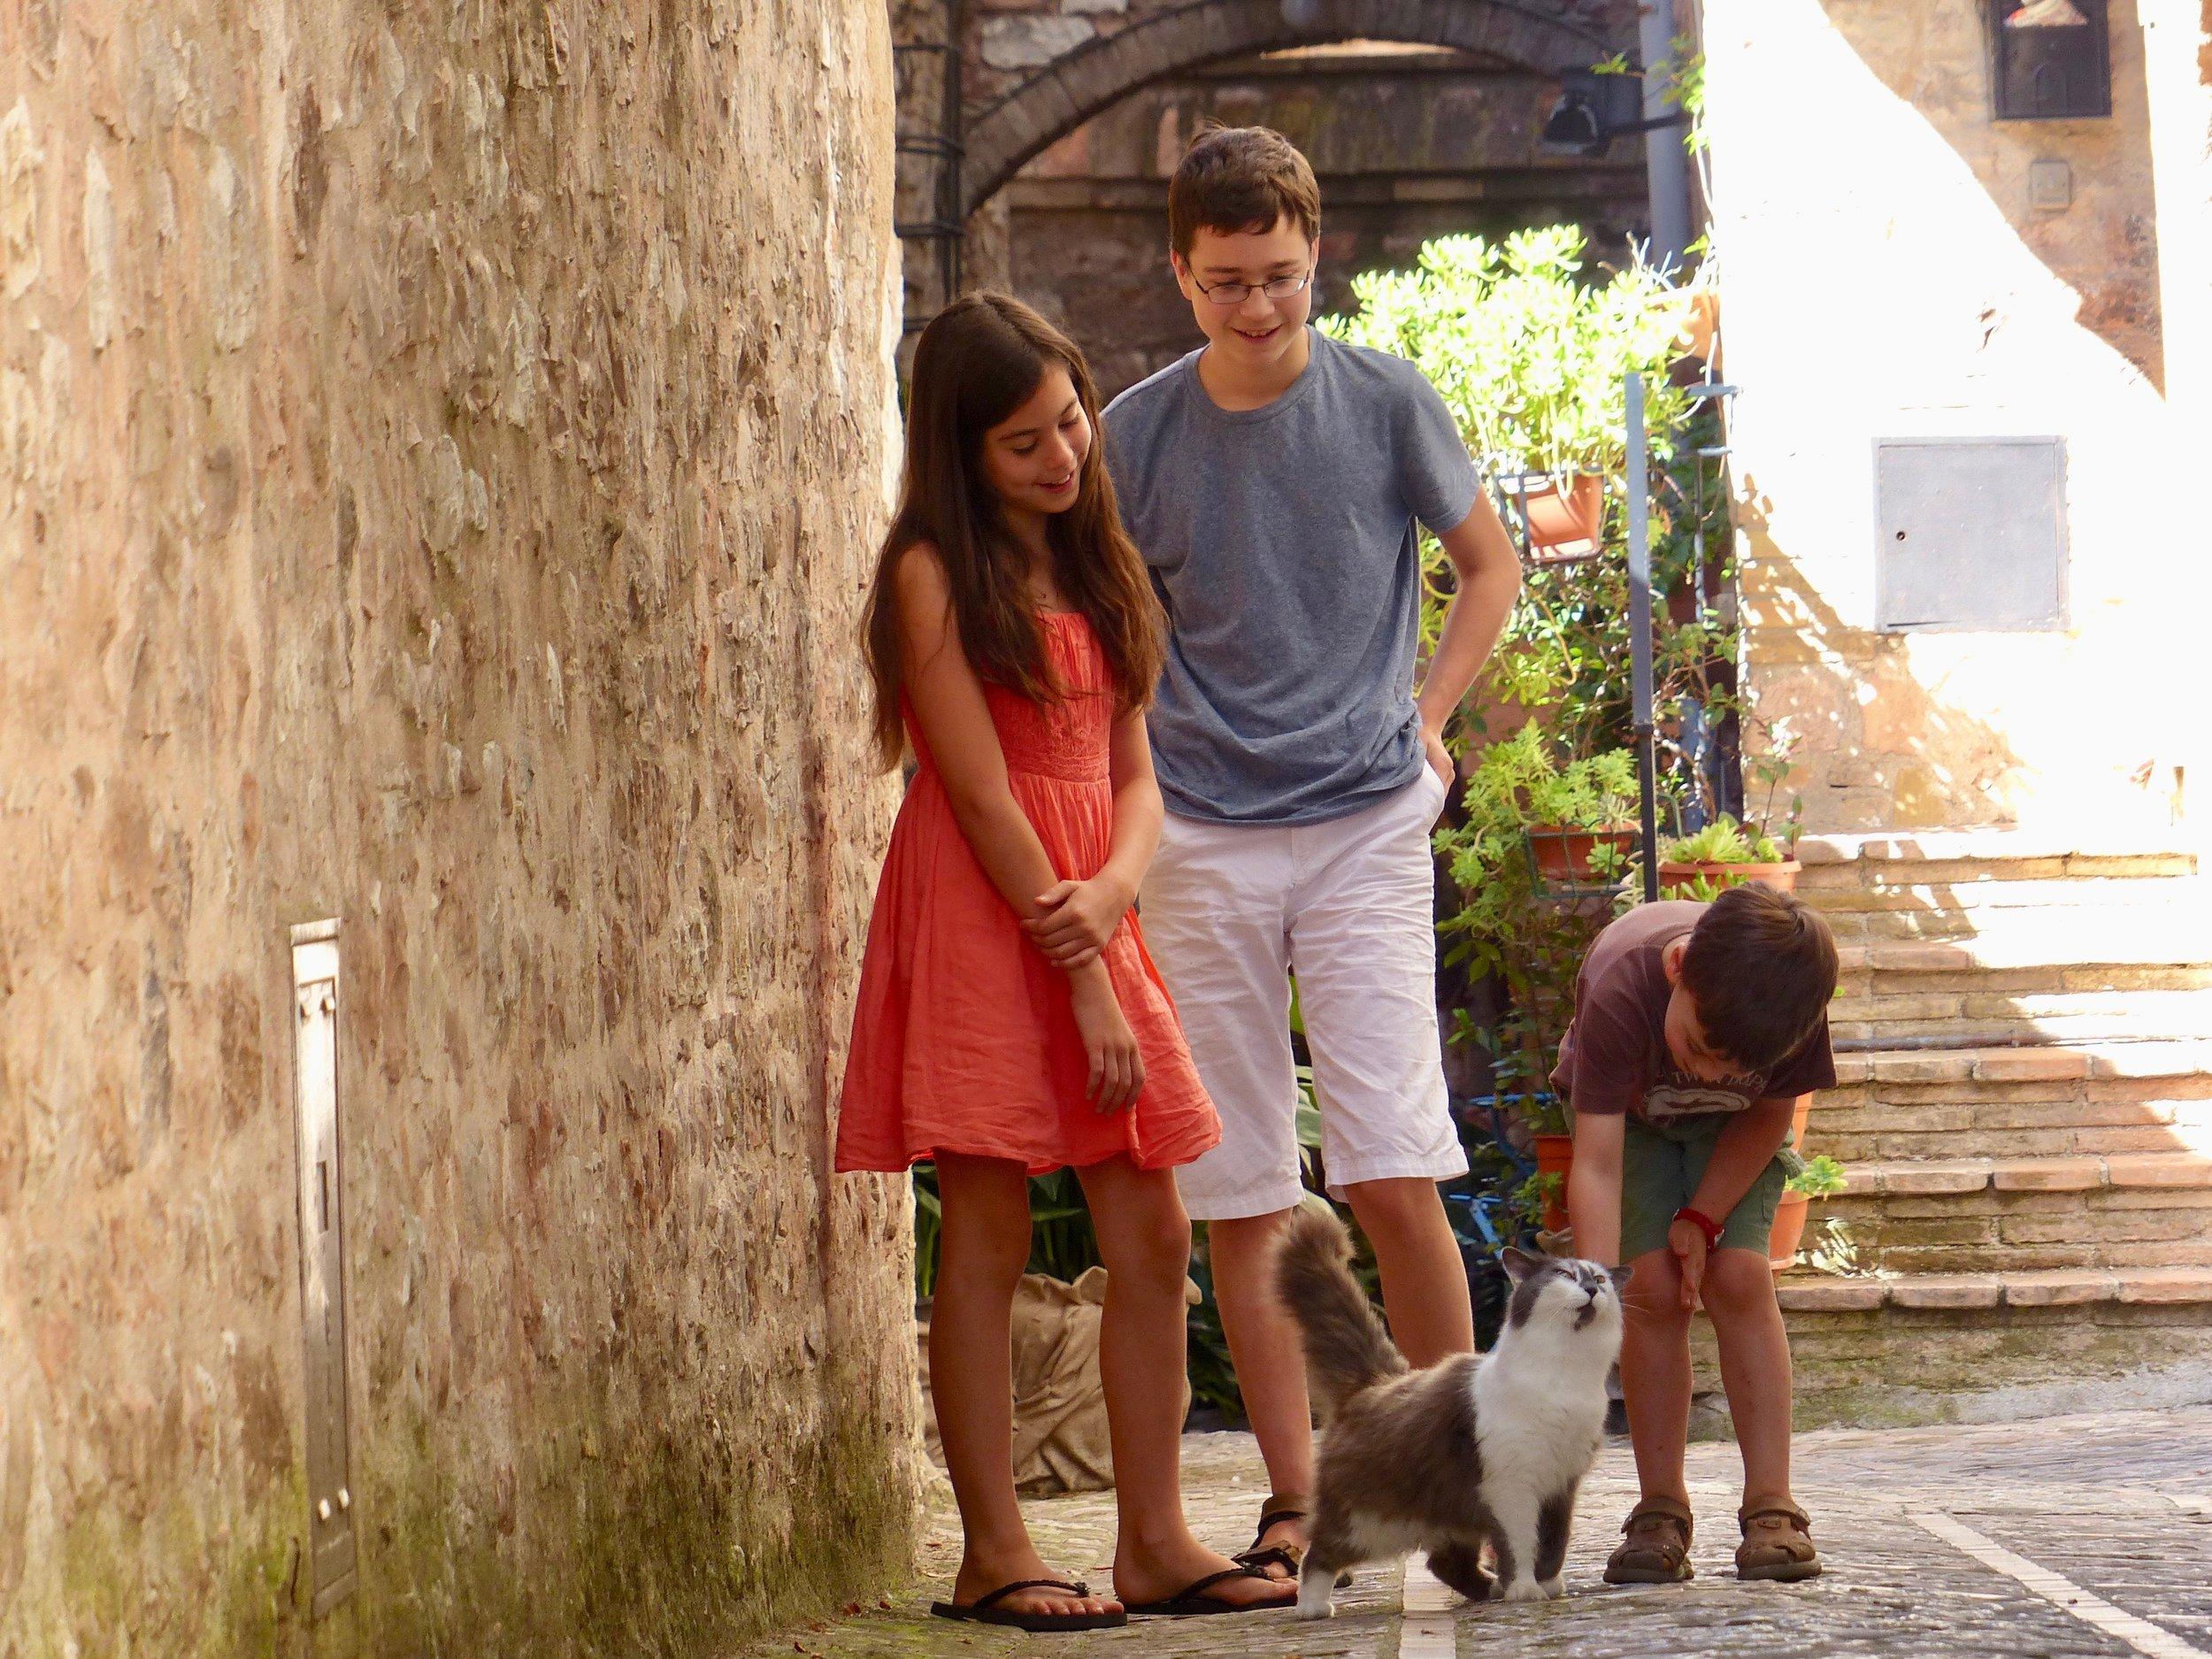 Kids in Spello, Italy 2013